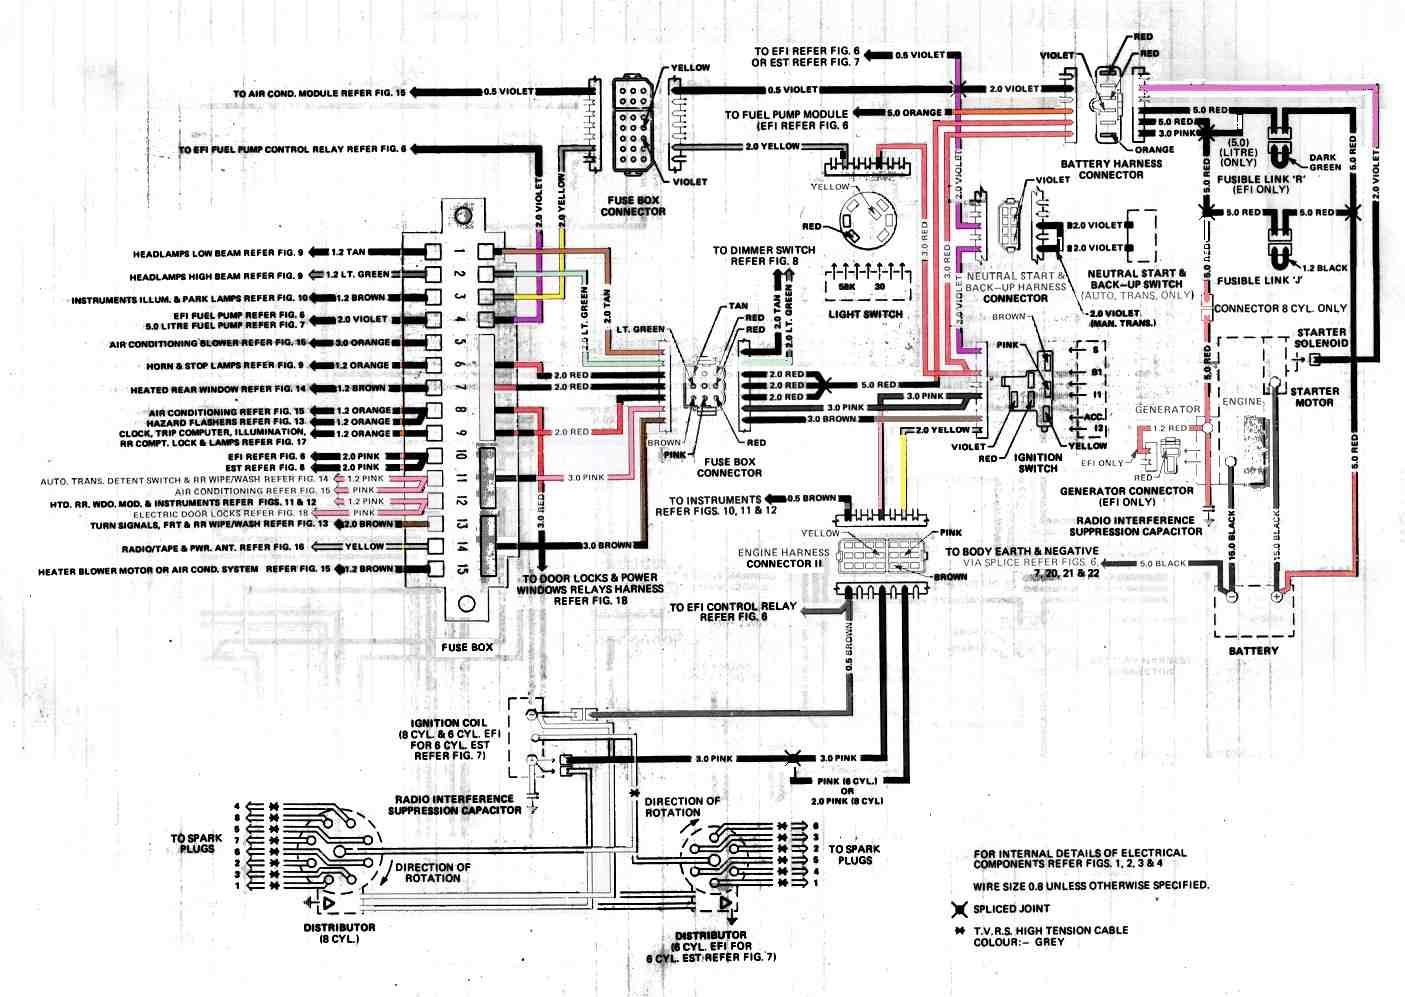 vs holden wiring diagram somurich com rh somurich com vs commodore speedo wiring diagram vs commodore wiring diagram stereo